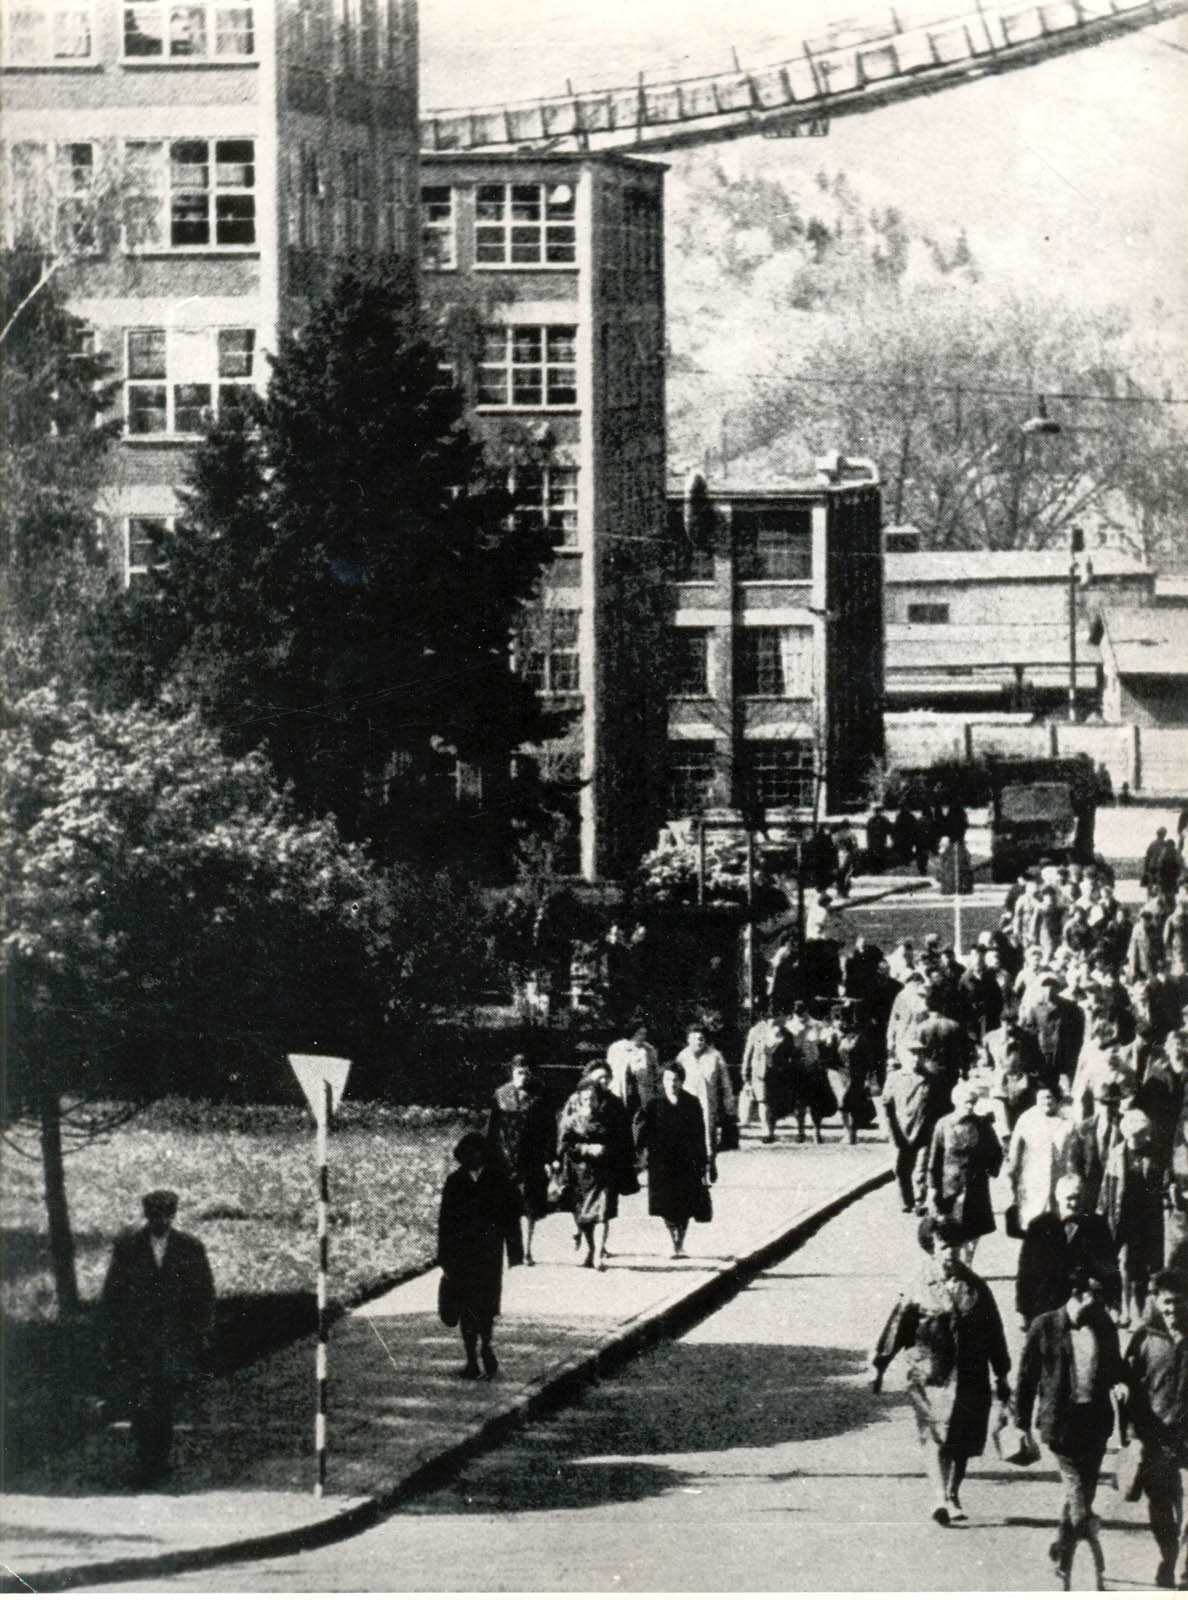 Bata factory 1960s Tomasz Batta Memorial House